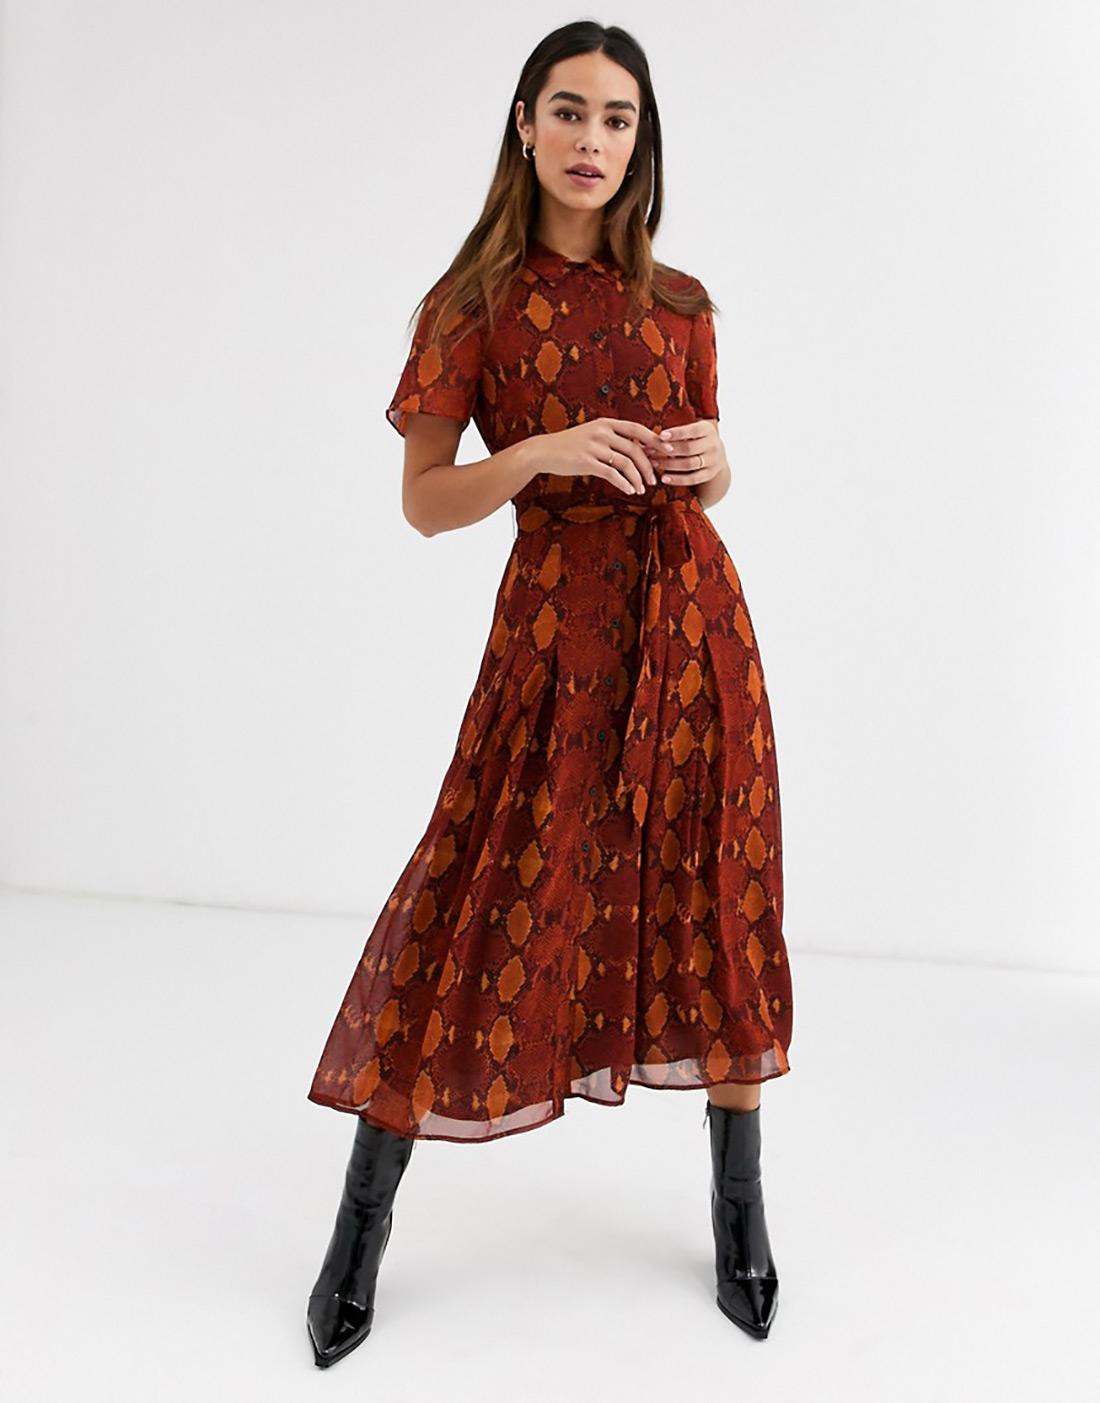 street style zagreb ženska moda jesen zima 2019/2020 kako kombinirati zmijski uzorka špica zagreb zagrebačka špica asos topshop h&m mytheresa designers look